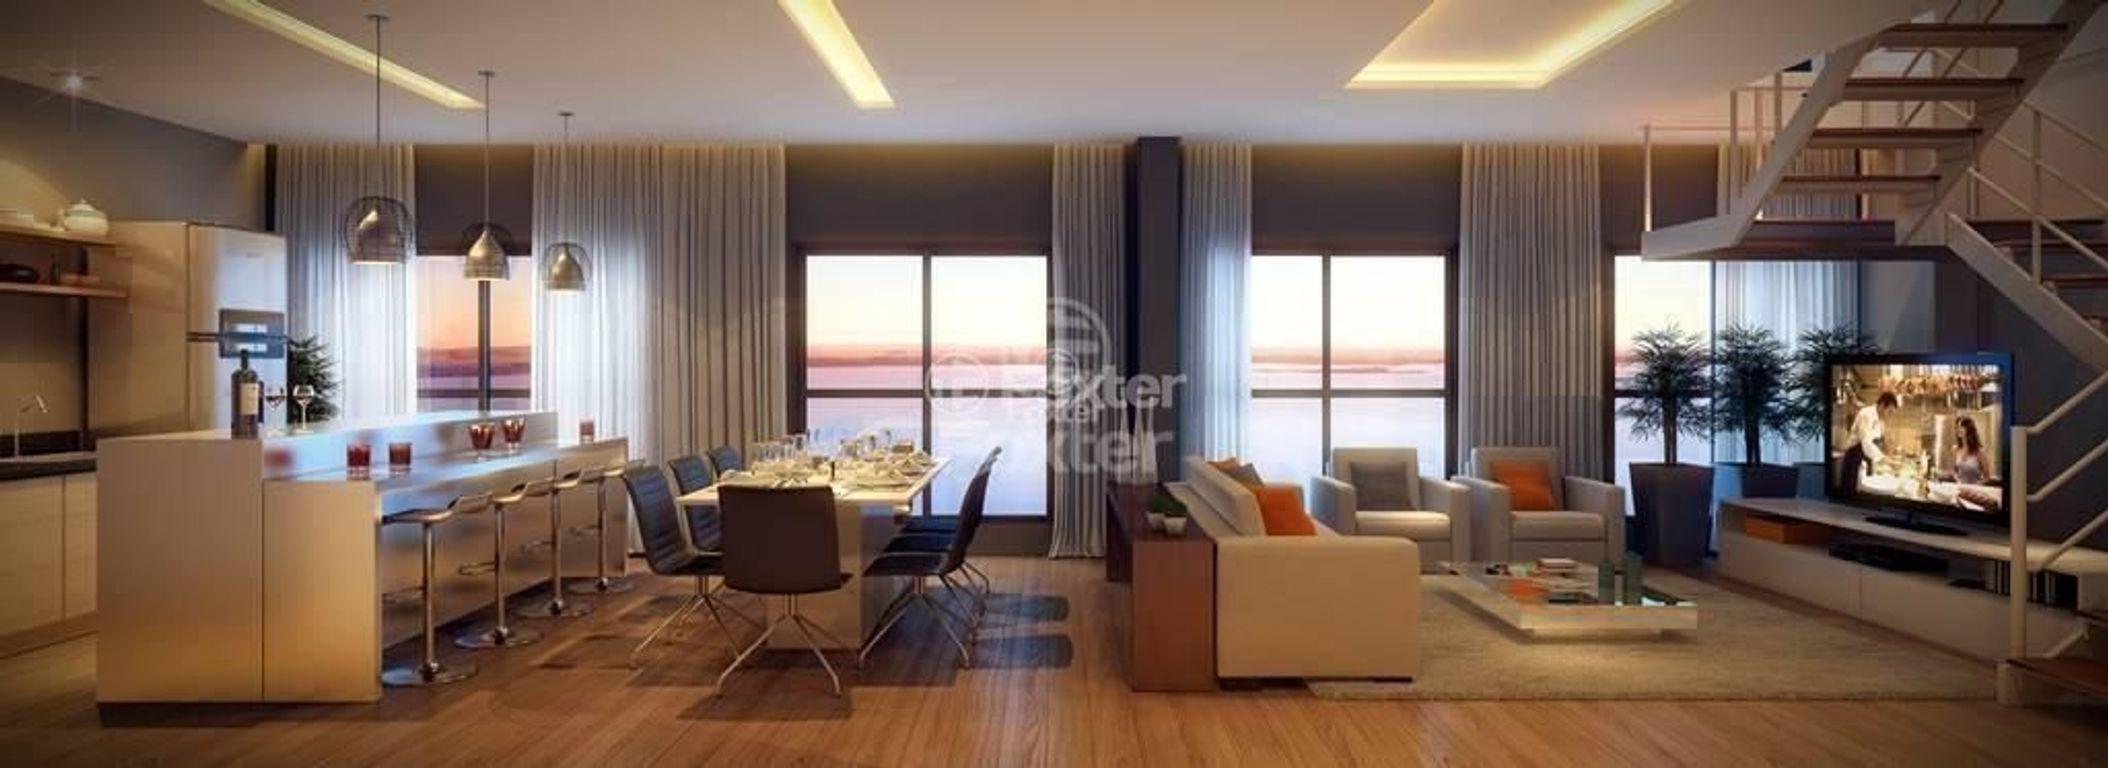 Foxter Imobiliária - Cobertura 3 Dorm, Cristal - Foto 11